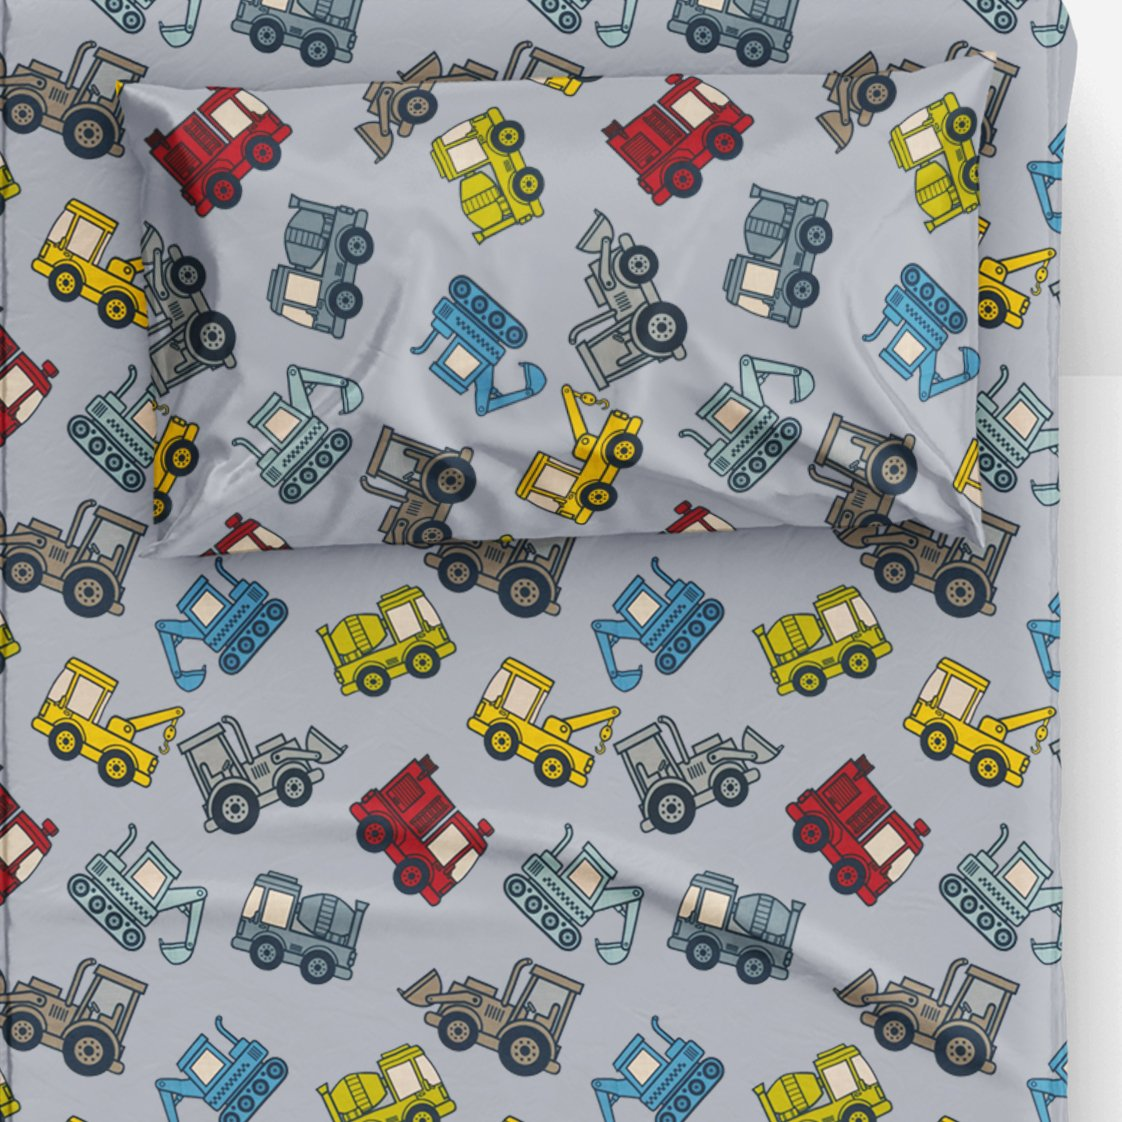 Thread Nebula Colorful Construction Trucks Boys Bed Sheet Set, Super Soft 3PC Kids Bedding Twin Size